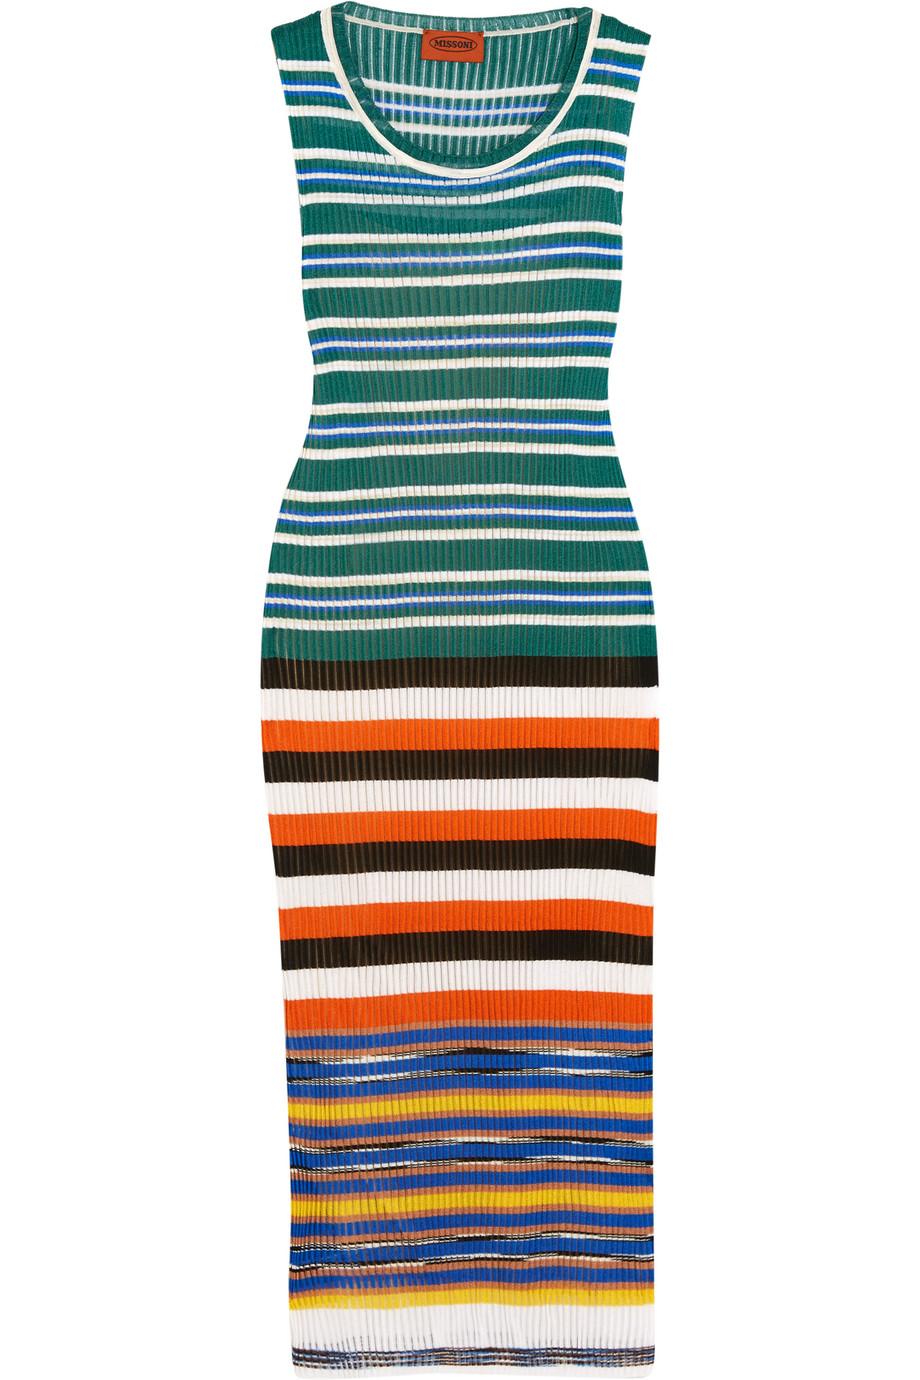 Missoni Striped Crochet-Knit Dress, Size: 44